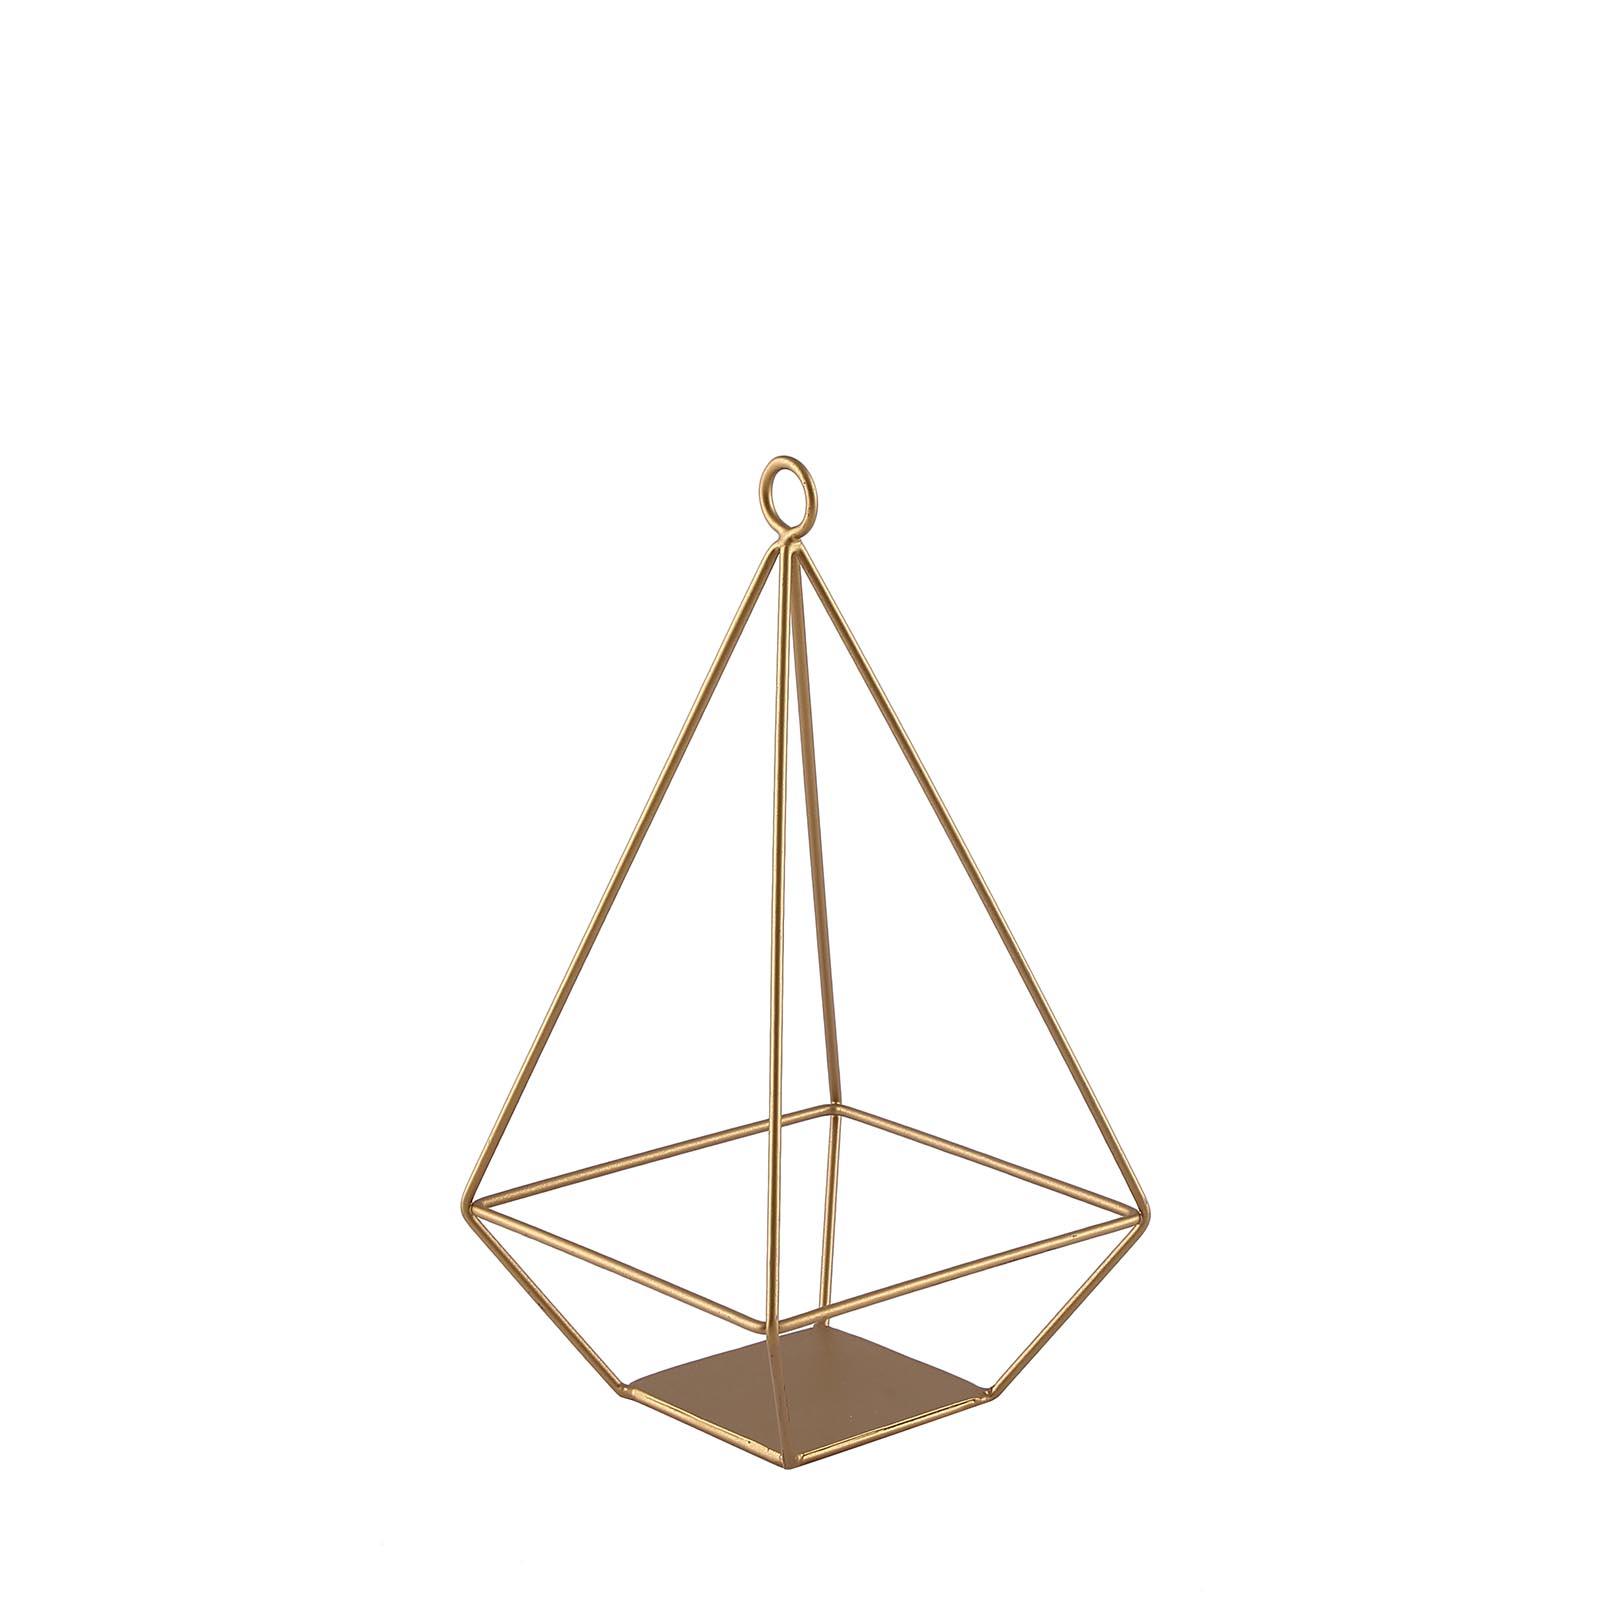 2 Pcs 9 5 Tall Geometric Candle Holders Metal Lanterns Wedding Centerpieces Wedding Supplies Centerpieces Table Decor